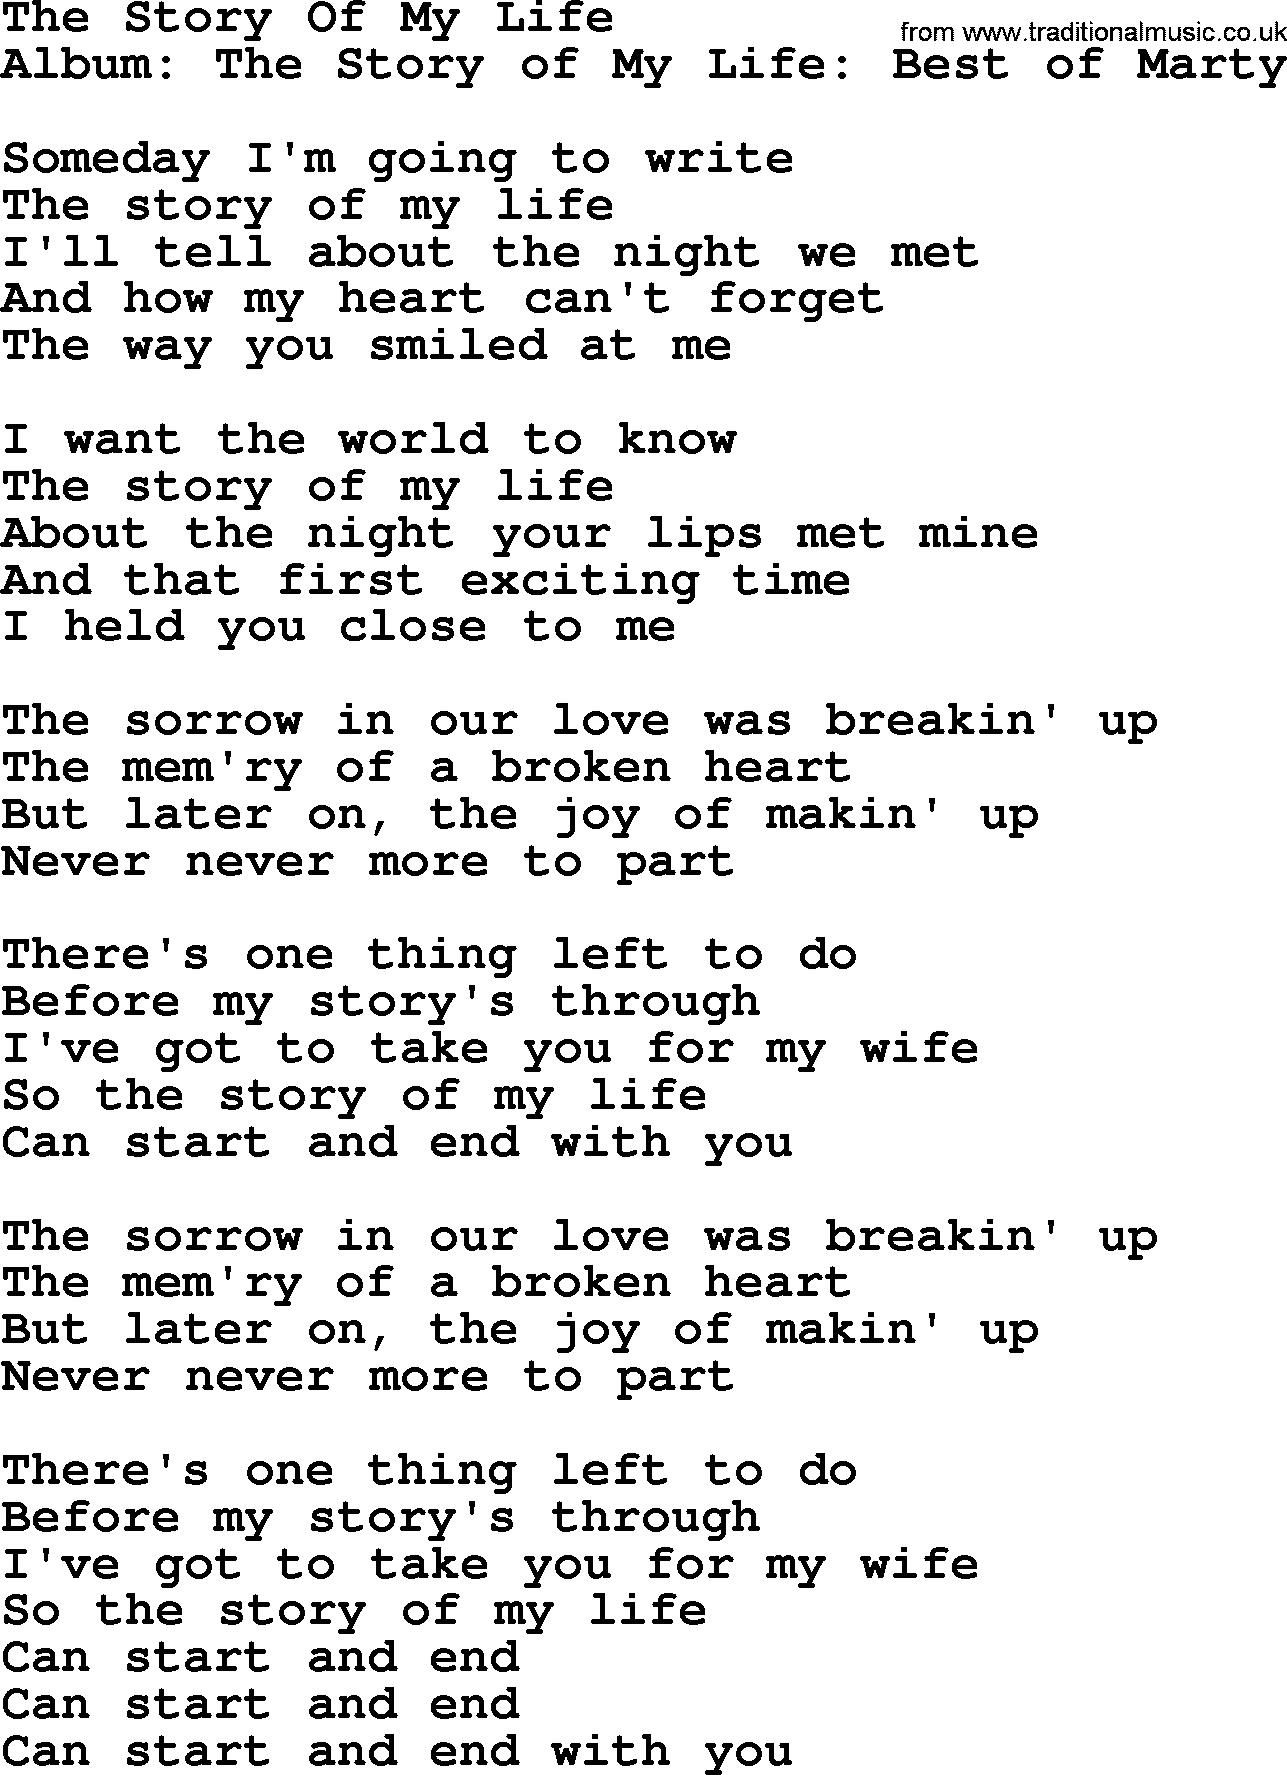 Story Of My Life Chords The Story Of My Life Marty Robbins Lyrics